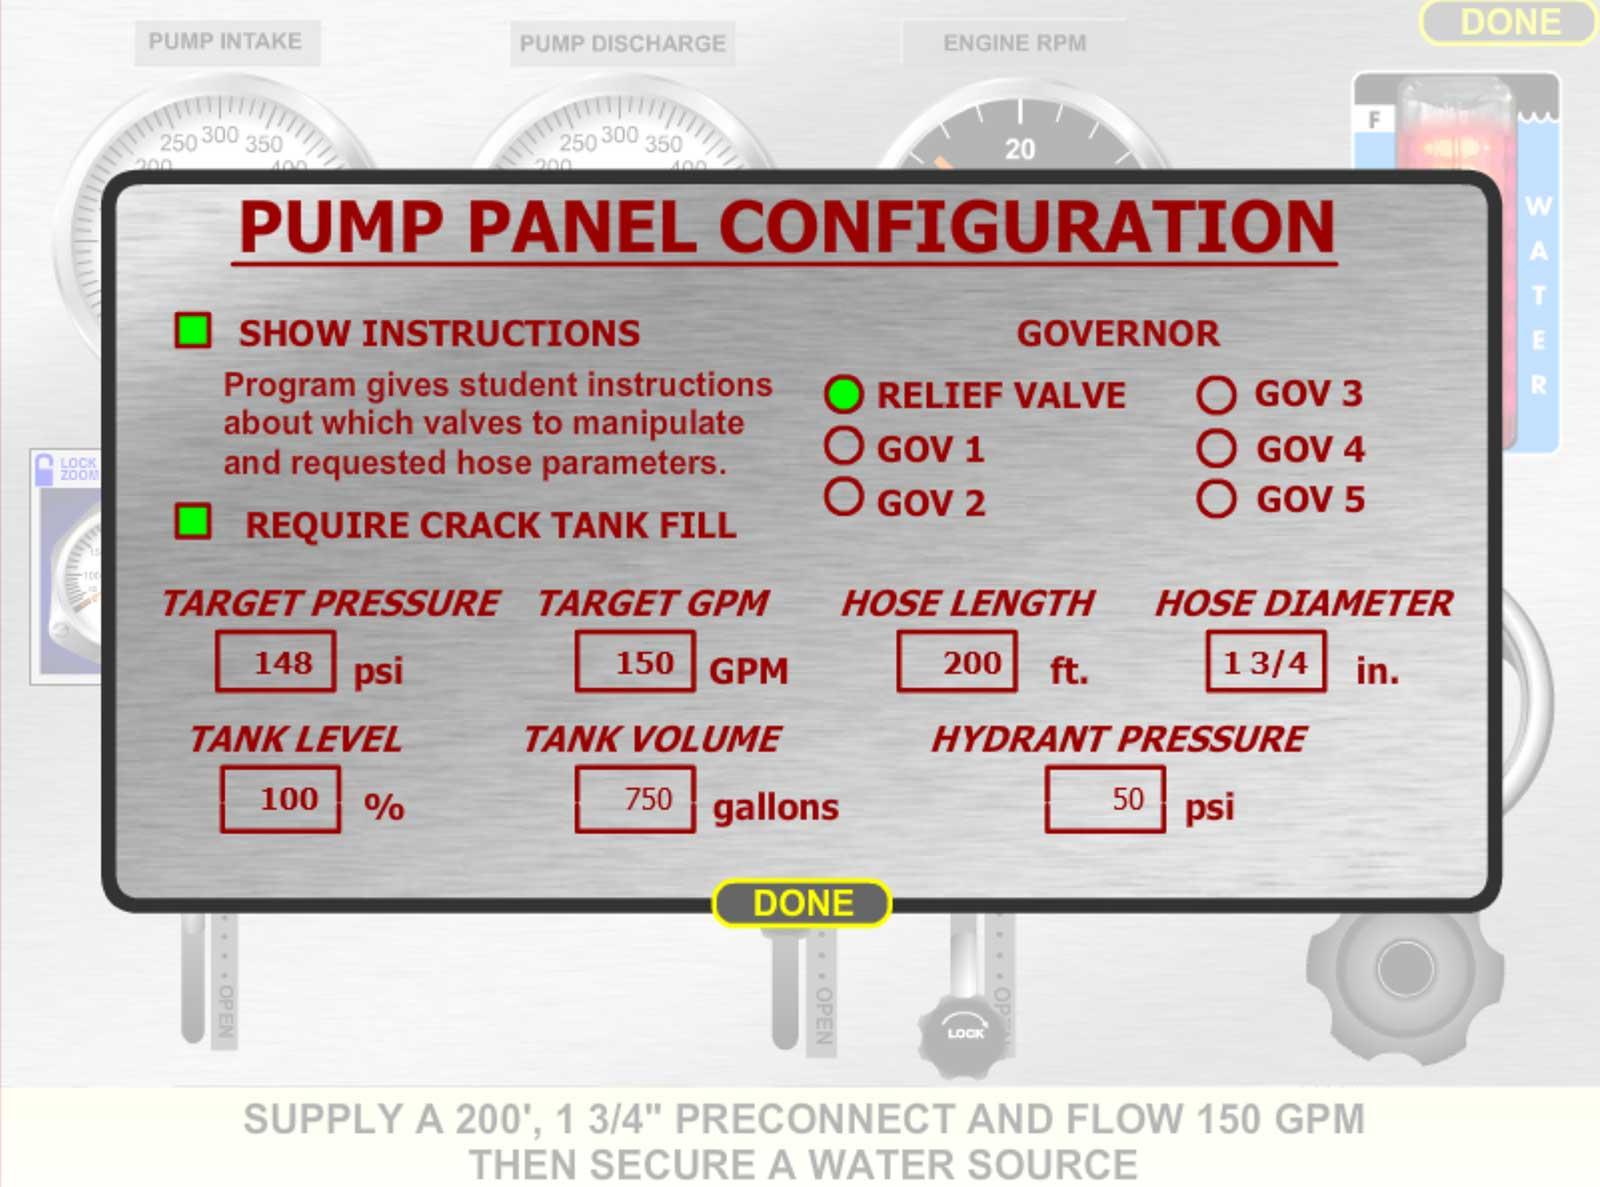 Pump panel configuration options